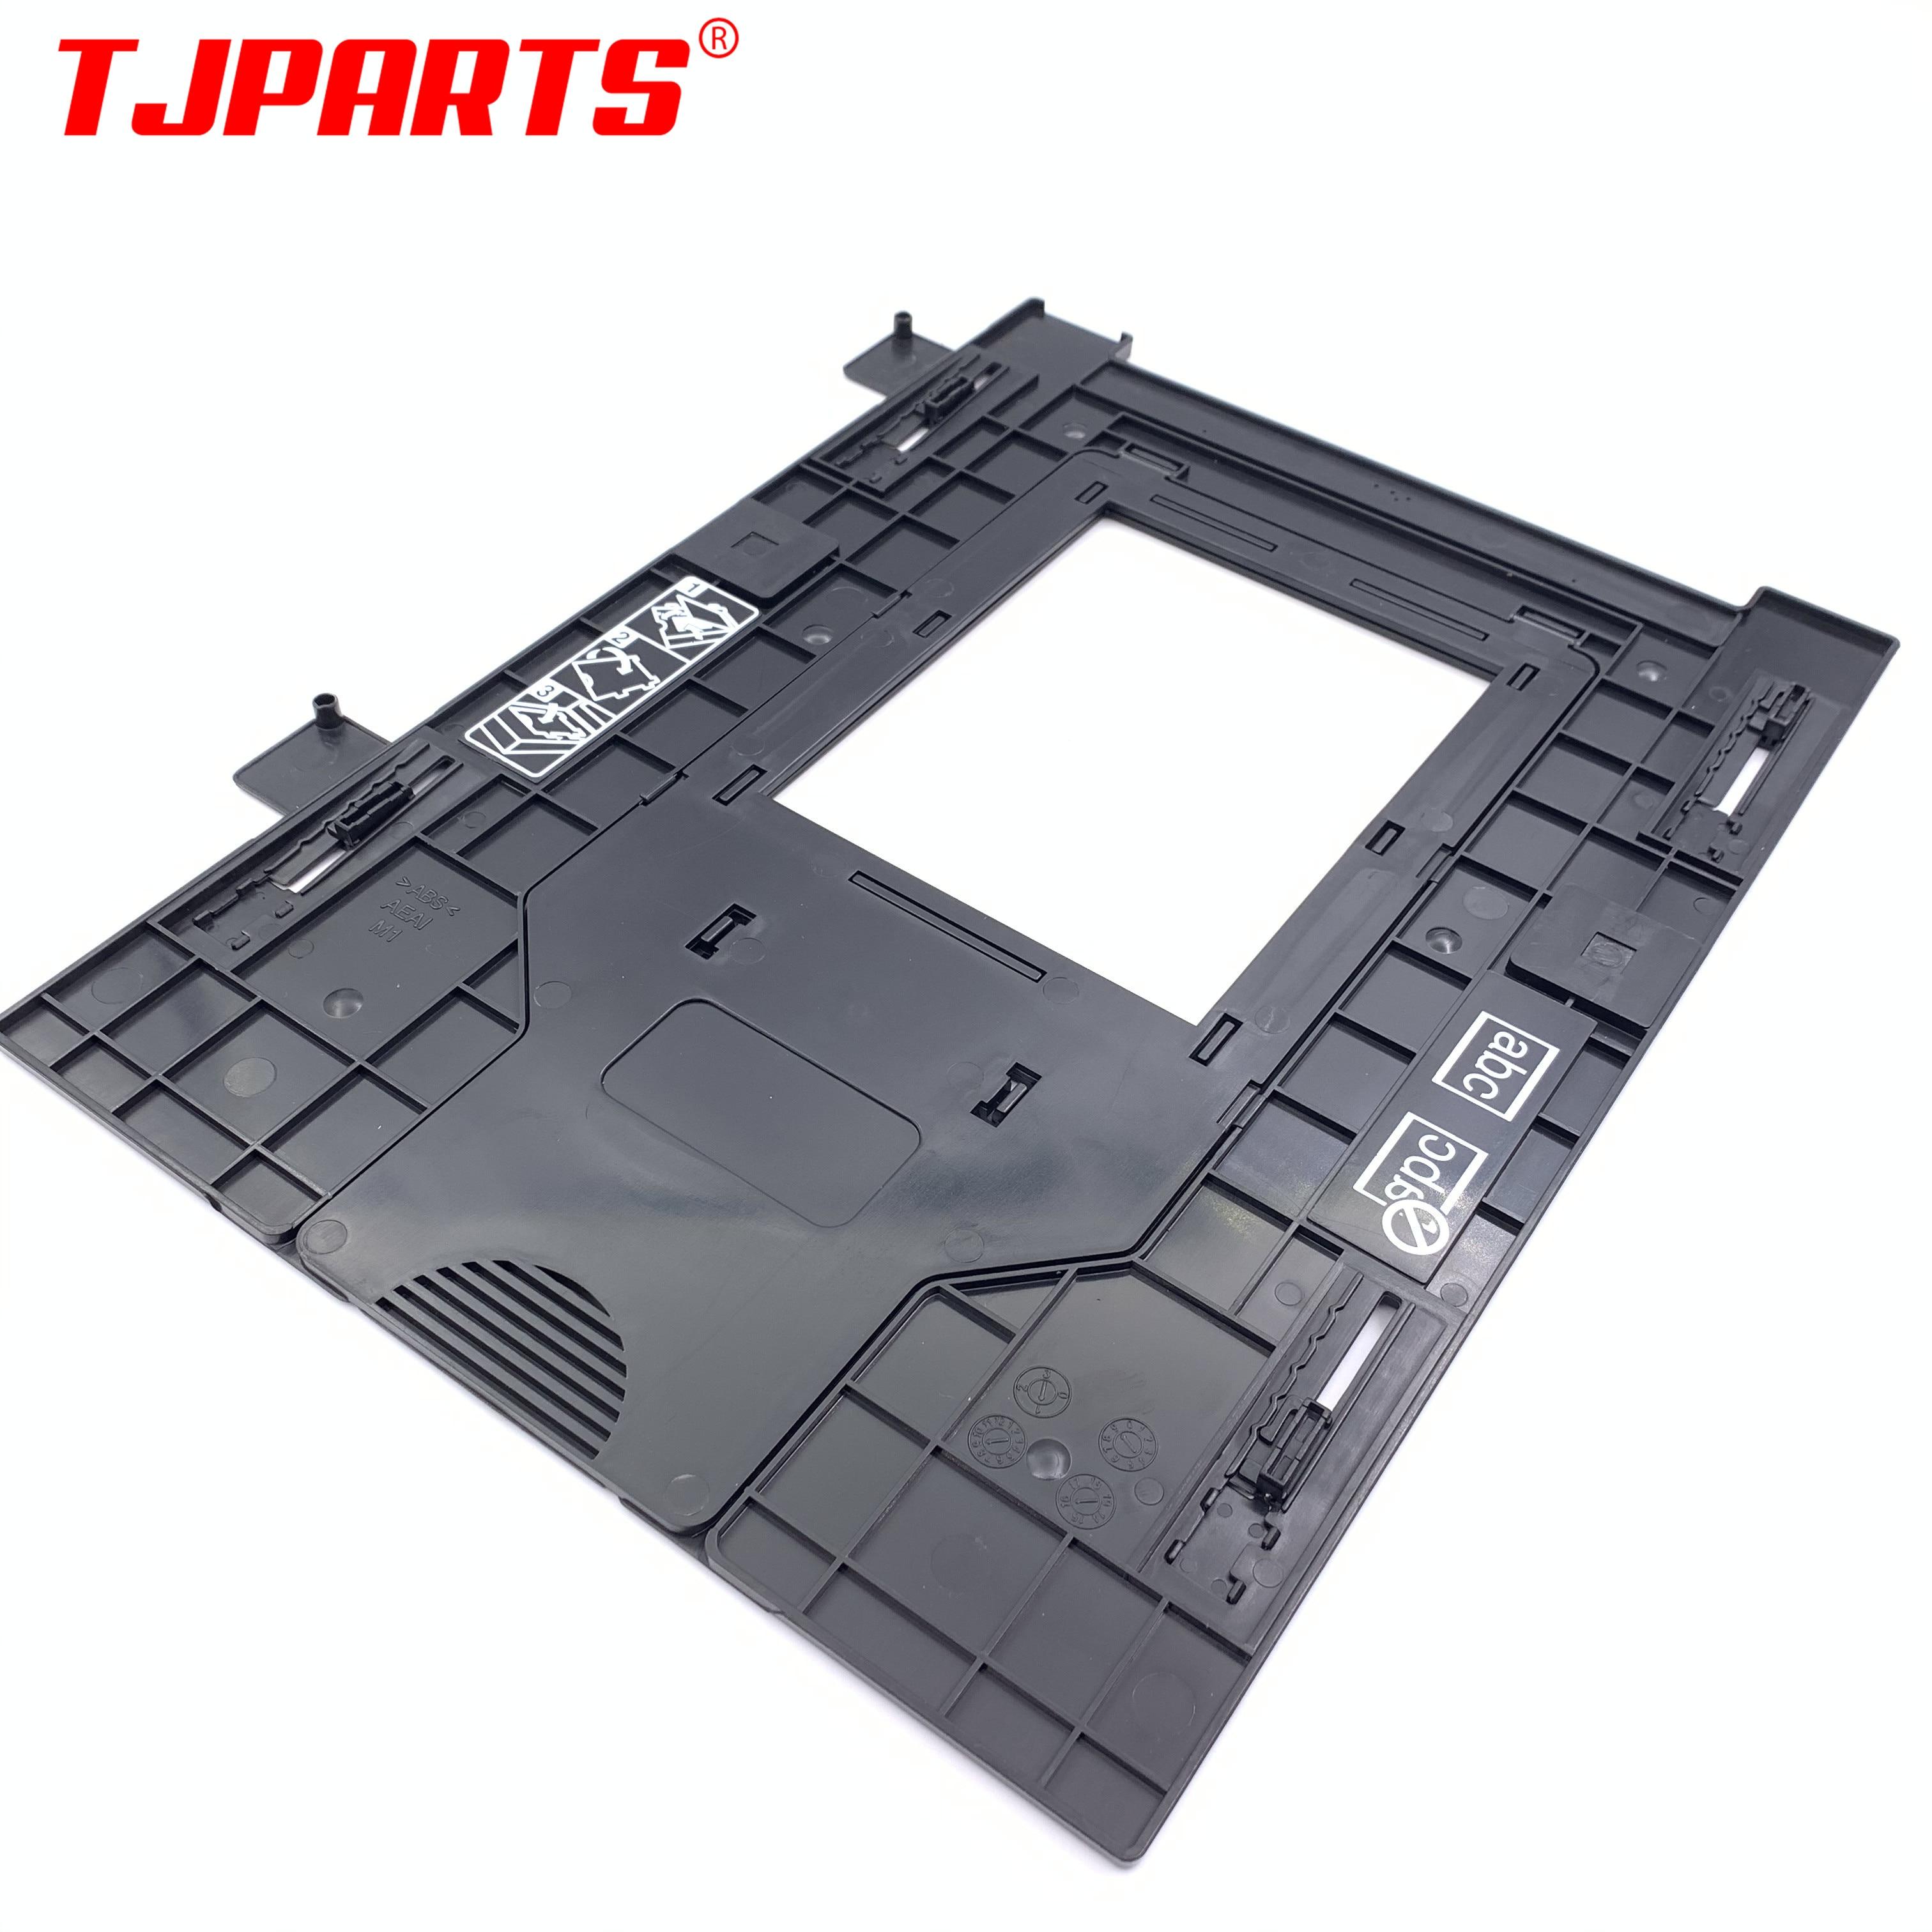 1 ud. * 4x5 pulgadas soporte de película foto negativa película protectora del escáner soporte de tira portaobjetos para Epson Perfection V700 V750 V800 V850